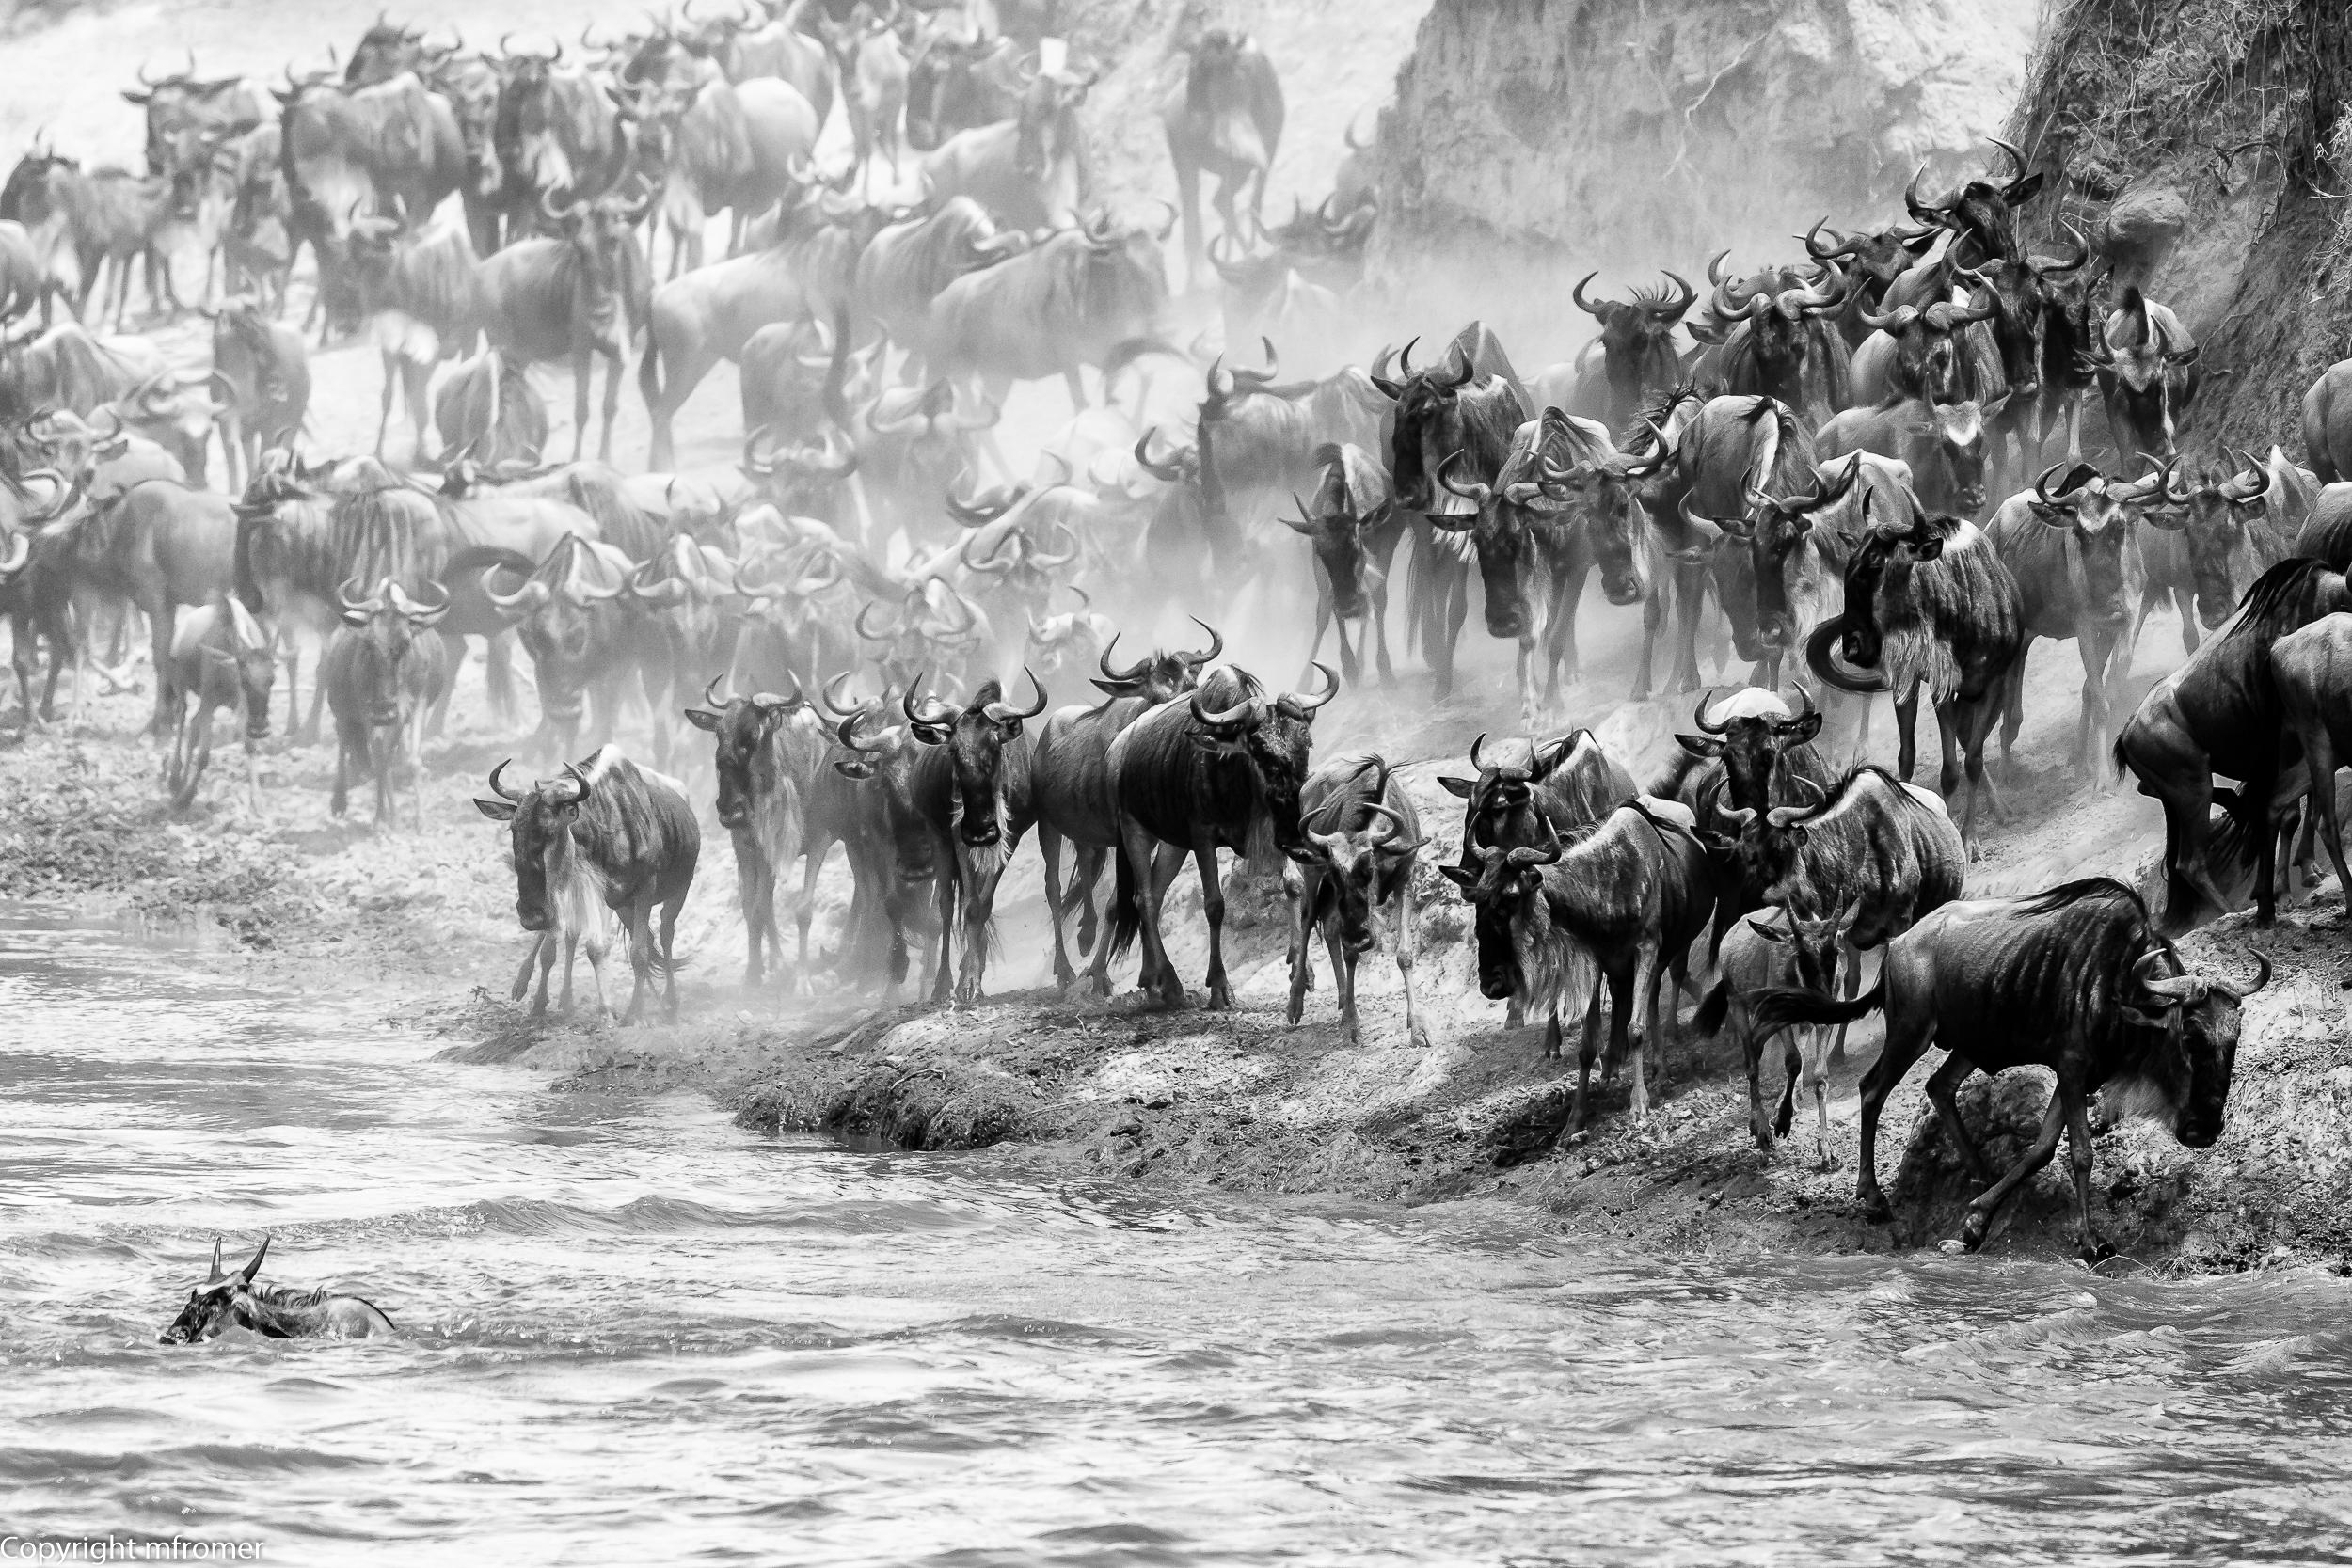 Mara river 2014